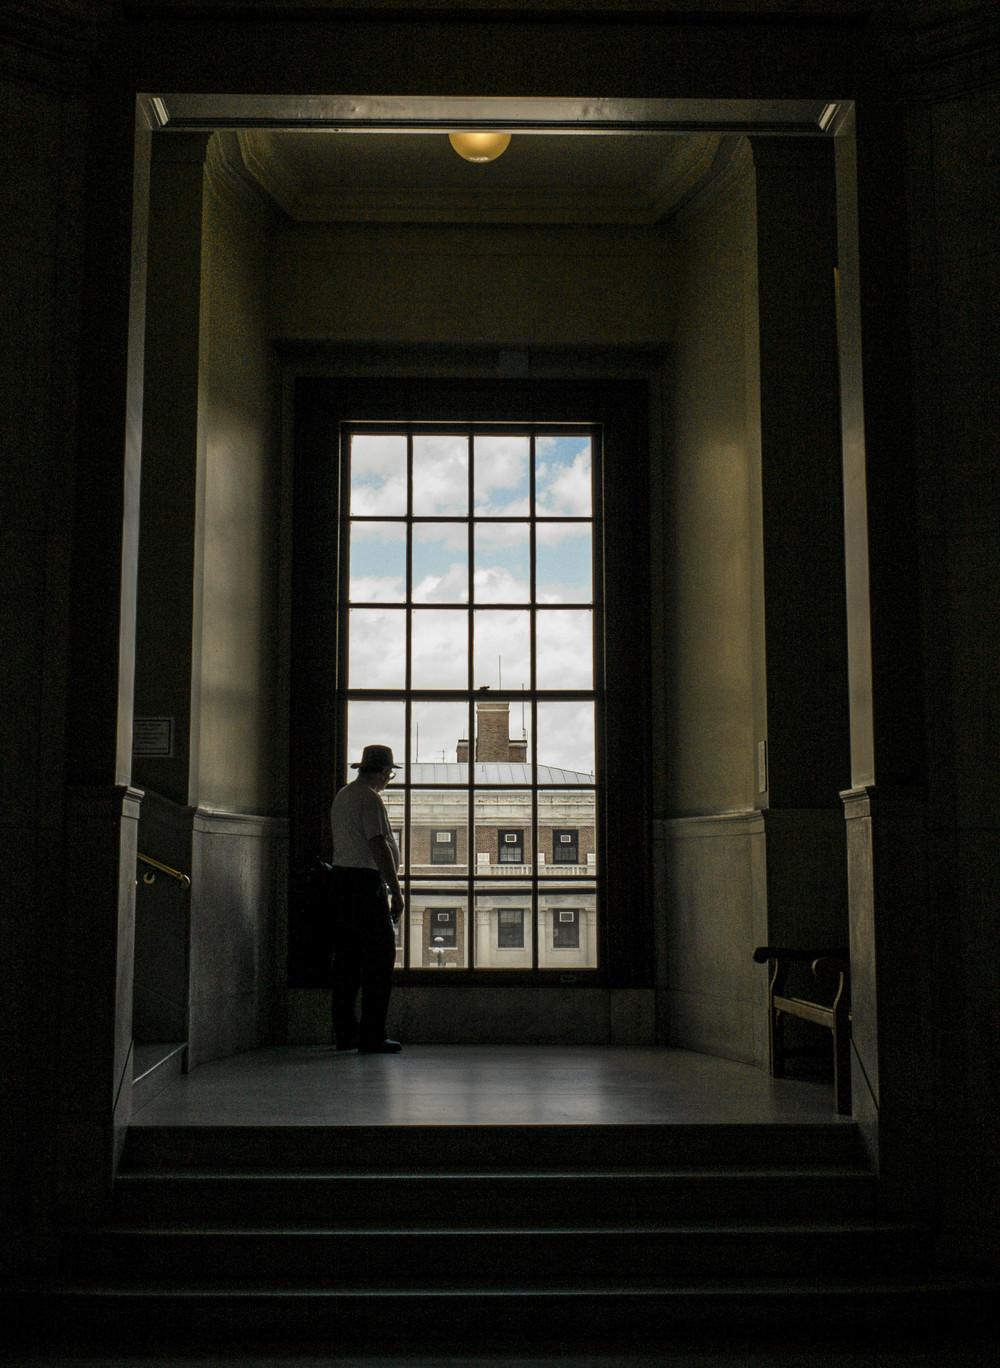 Rhode Island State House, Providence, Rhode Island  Leica M, 35mm Summicron, f/8.0, 1/1000s, ISO 800